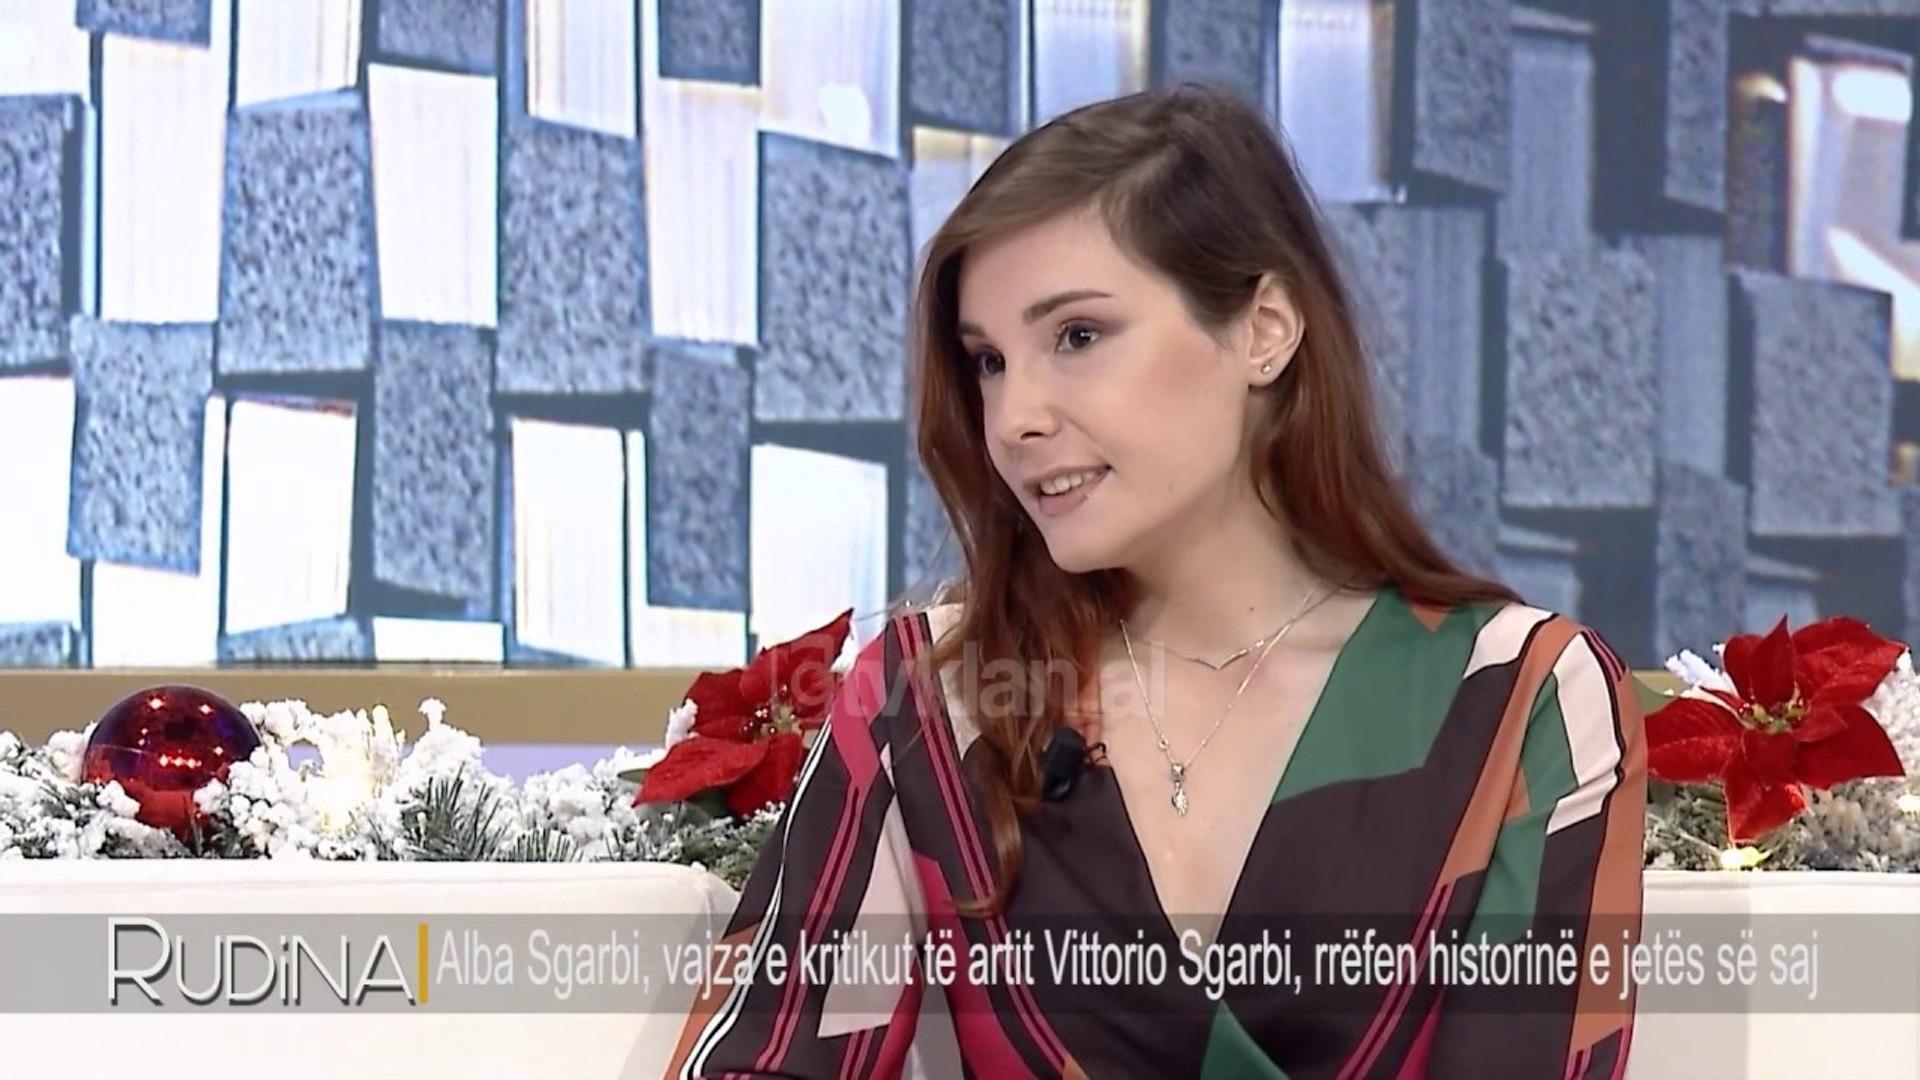 Kontakt me femra shqiptare